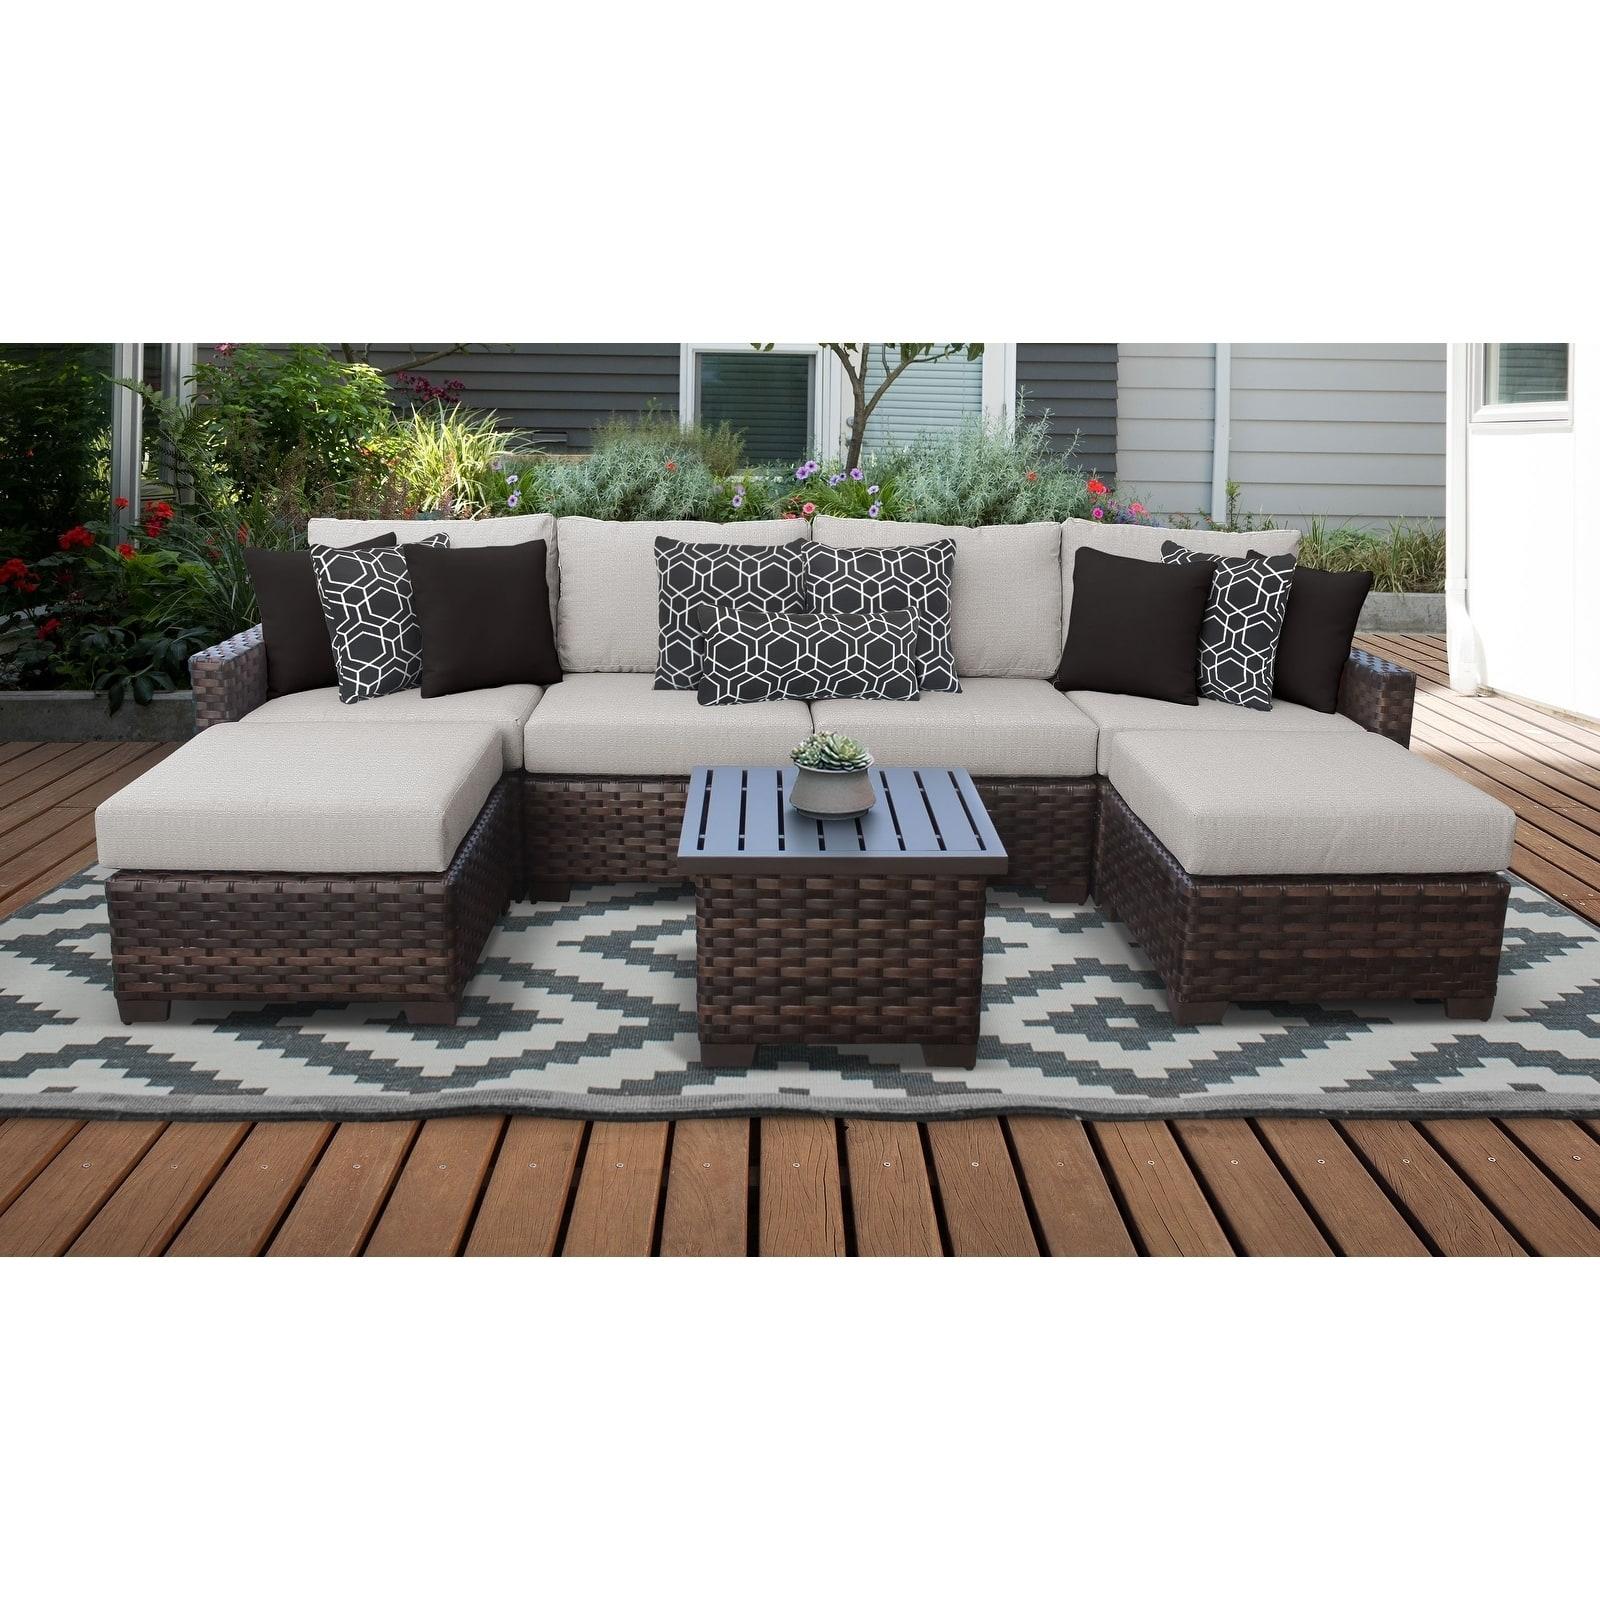 Best Furniture Deals Online: Buy Outdoor Sofas, Chairs & Sectionals Online At Overstock